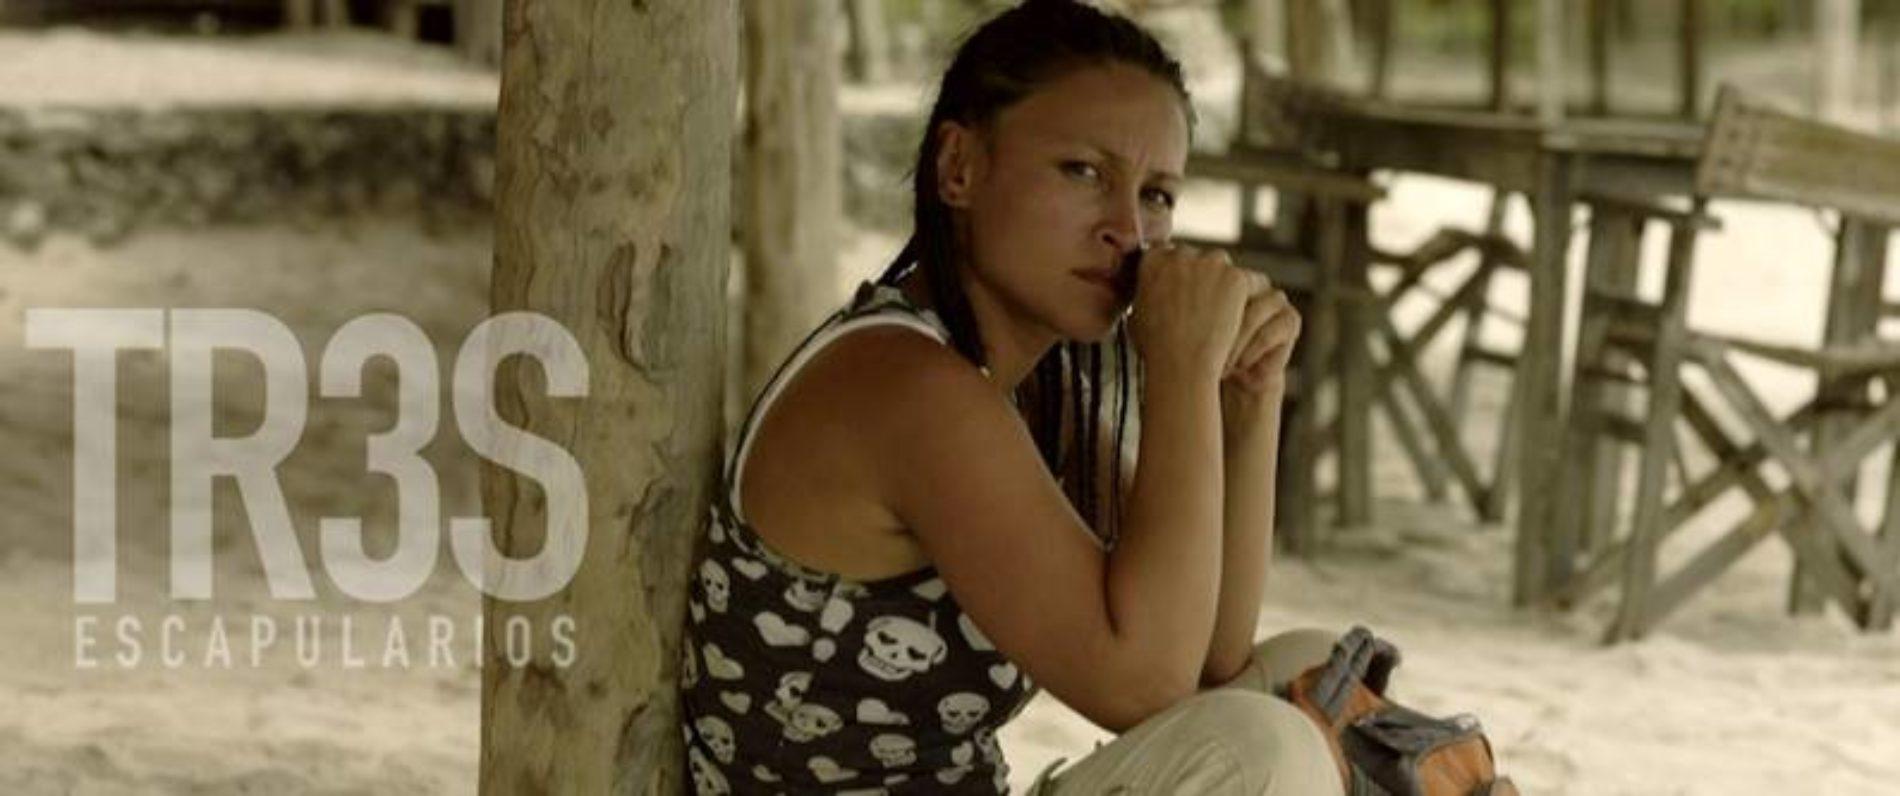 PREMIO A ISABEL JIMÉNEZ EN EL COLOMBIAN FILM FESTIVAL DE NY